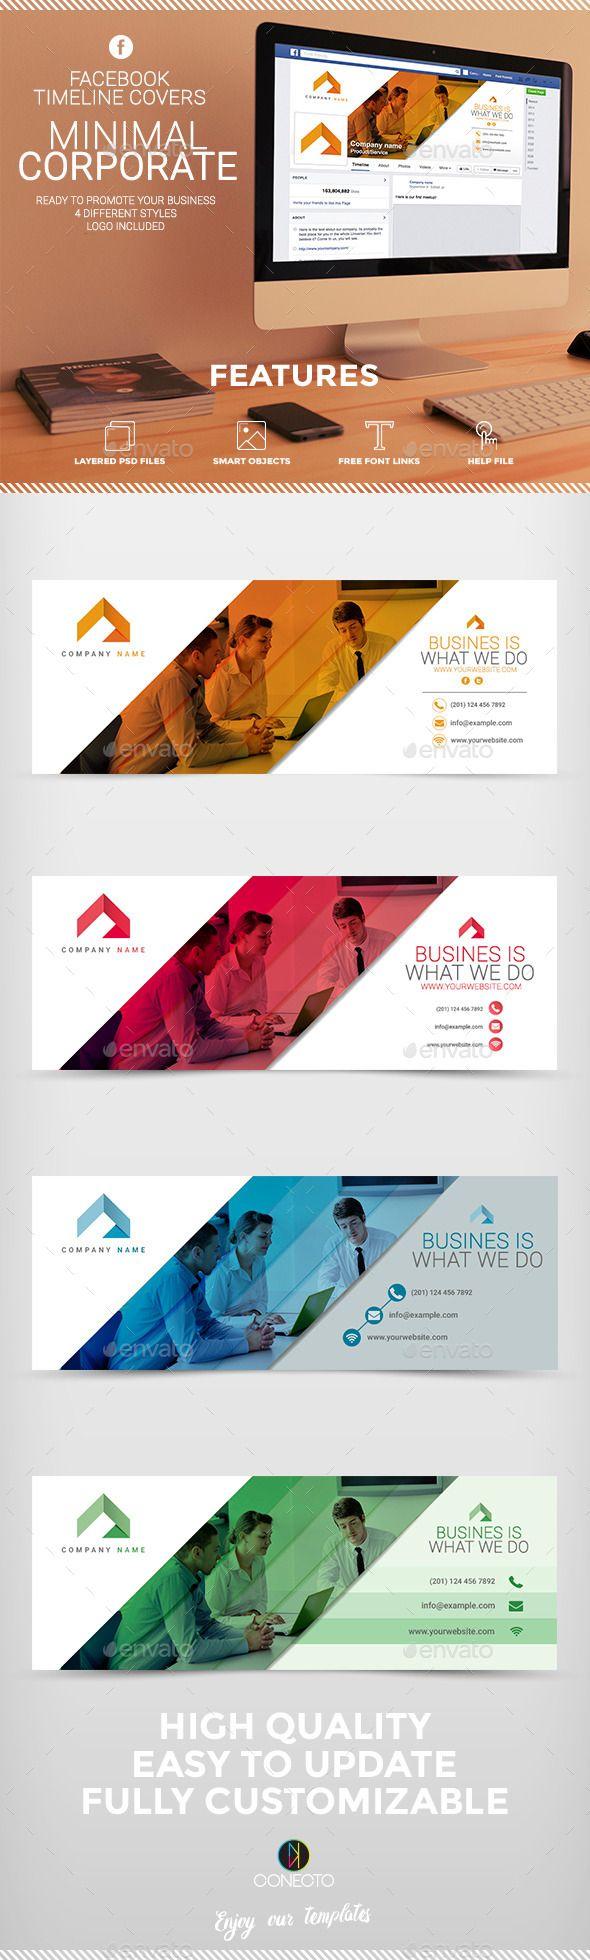 Facebook Timeline Cover - Minimal Corporate Template PSD #design Download…